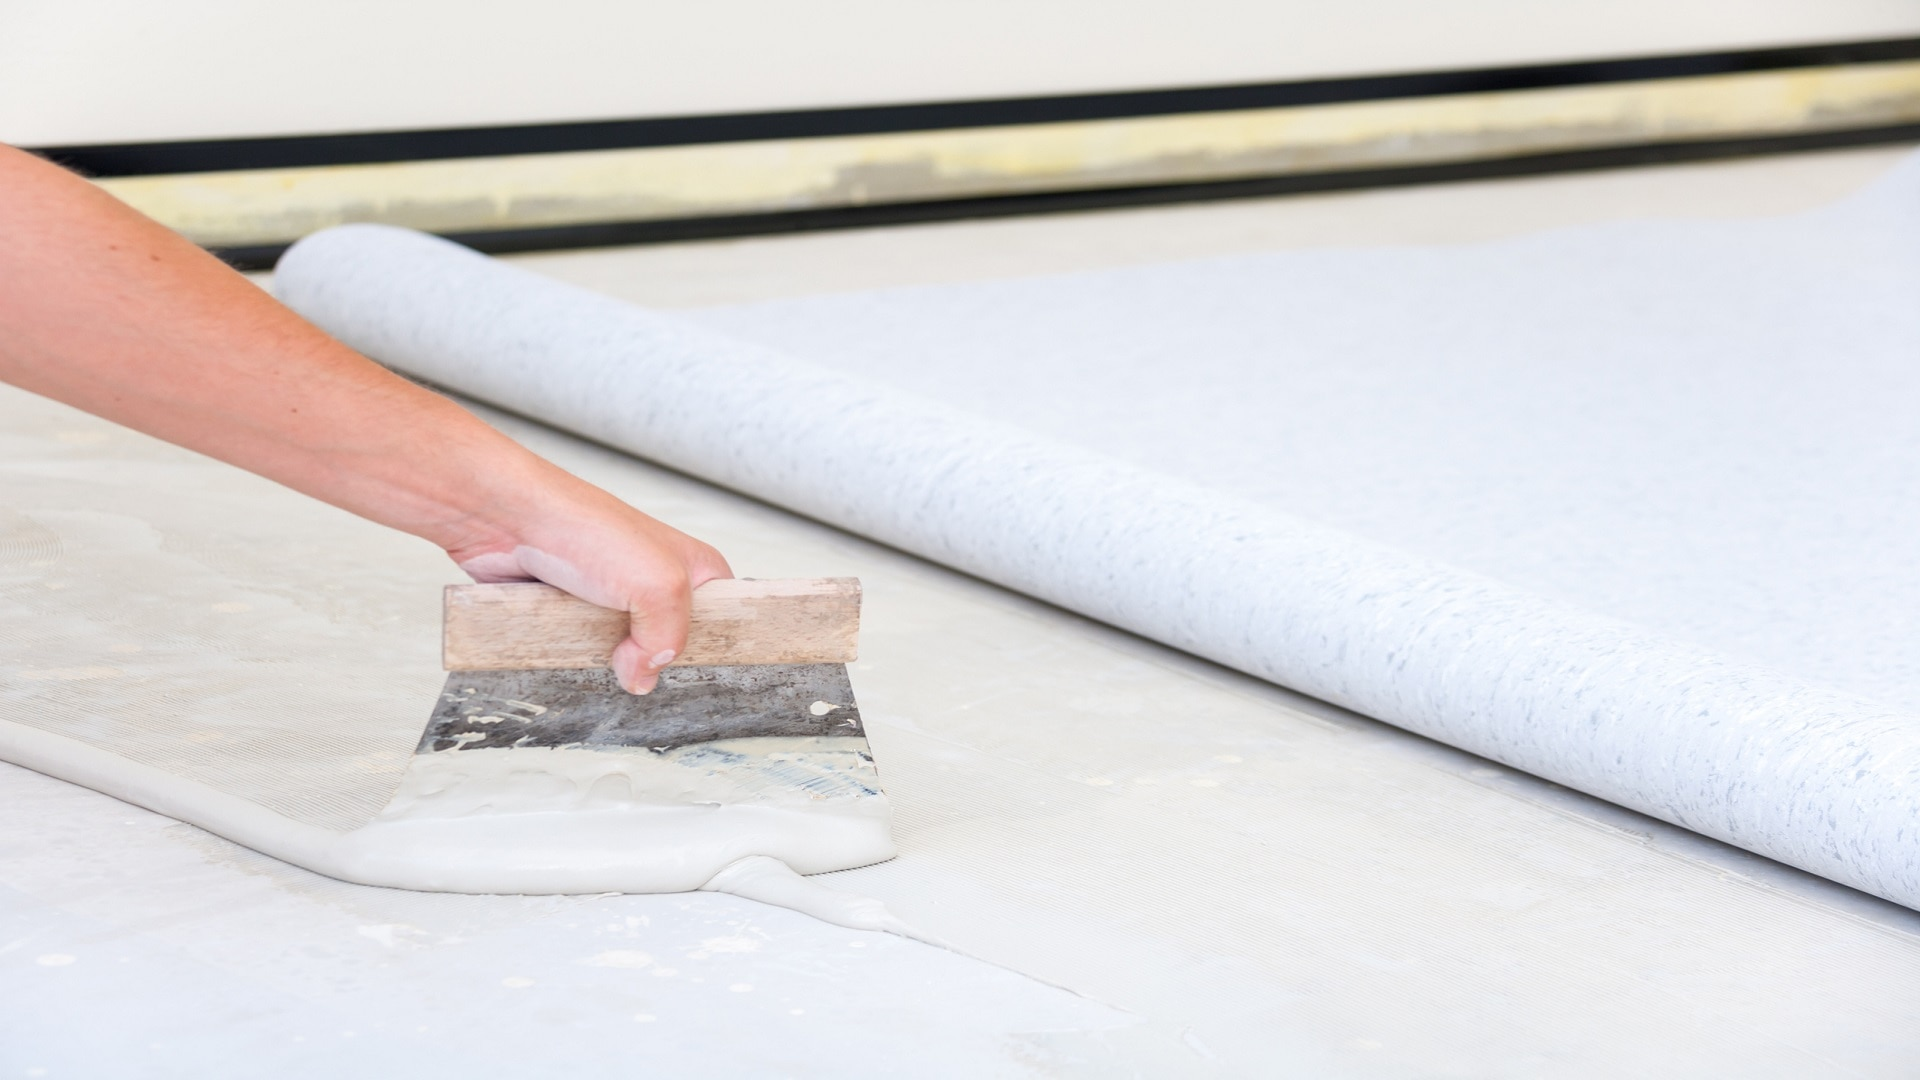 installation de sols en pvc devis et prix propos s par hellocasa izi by edf. Black Bedroom Furniture Sets. Home Design Ideas